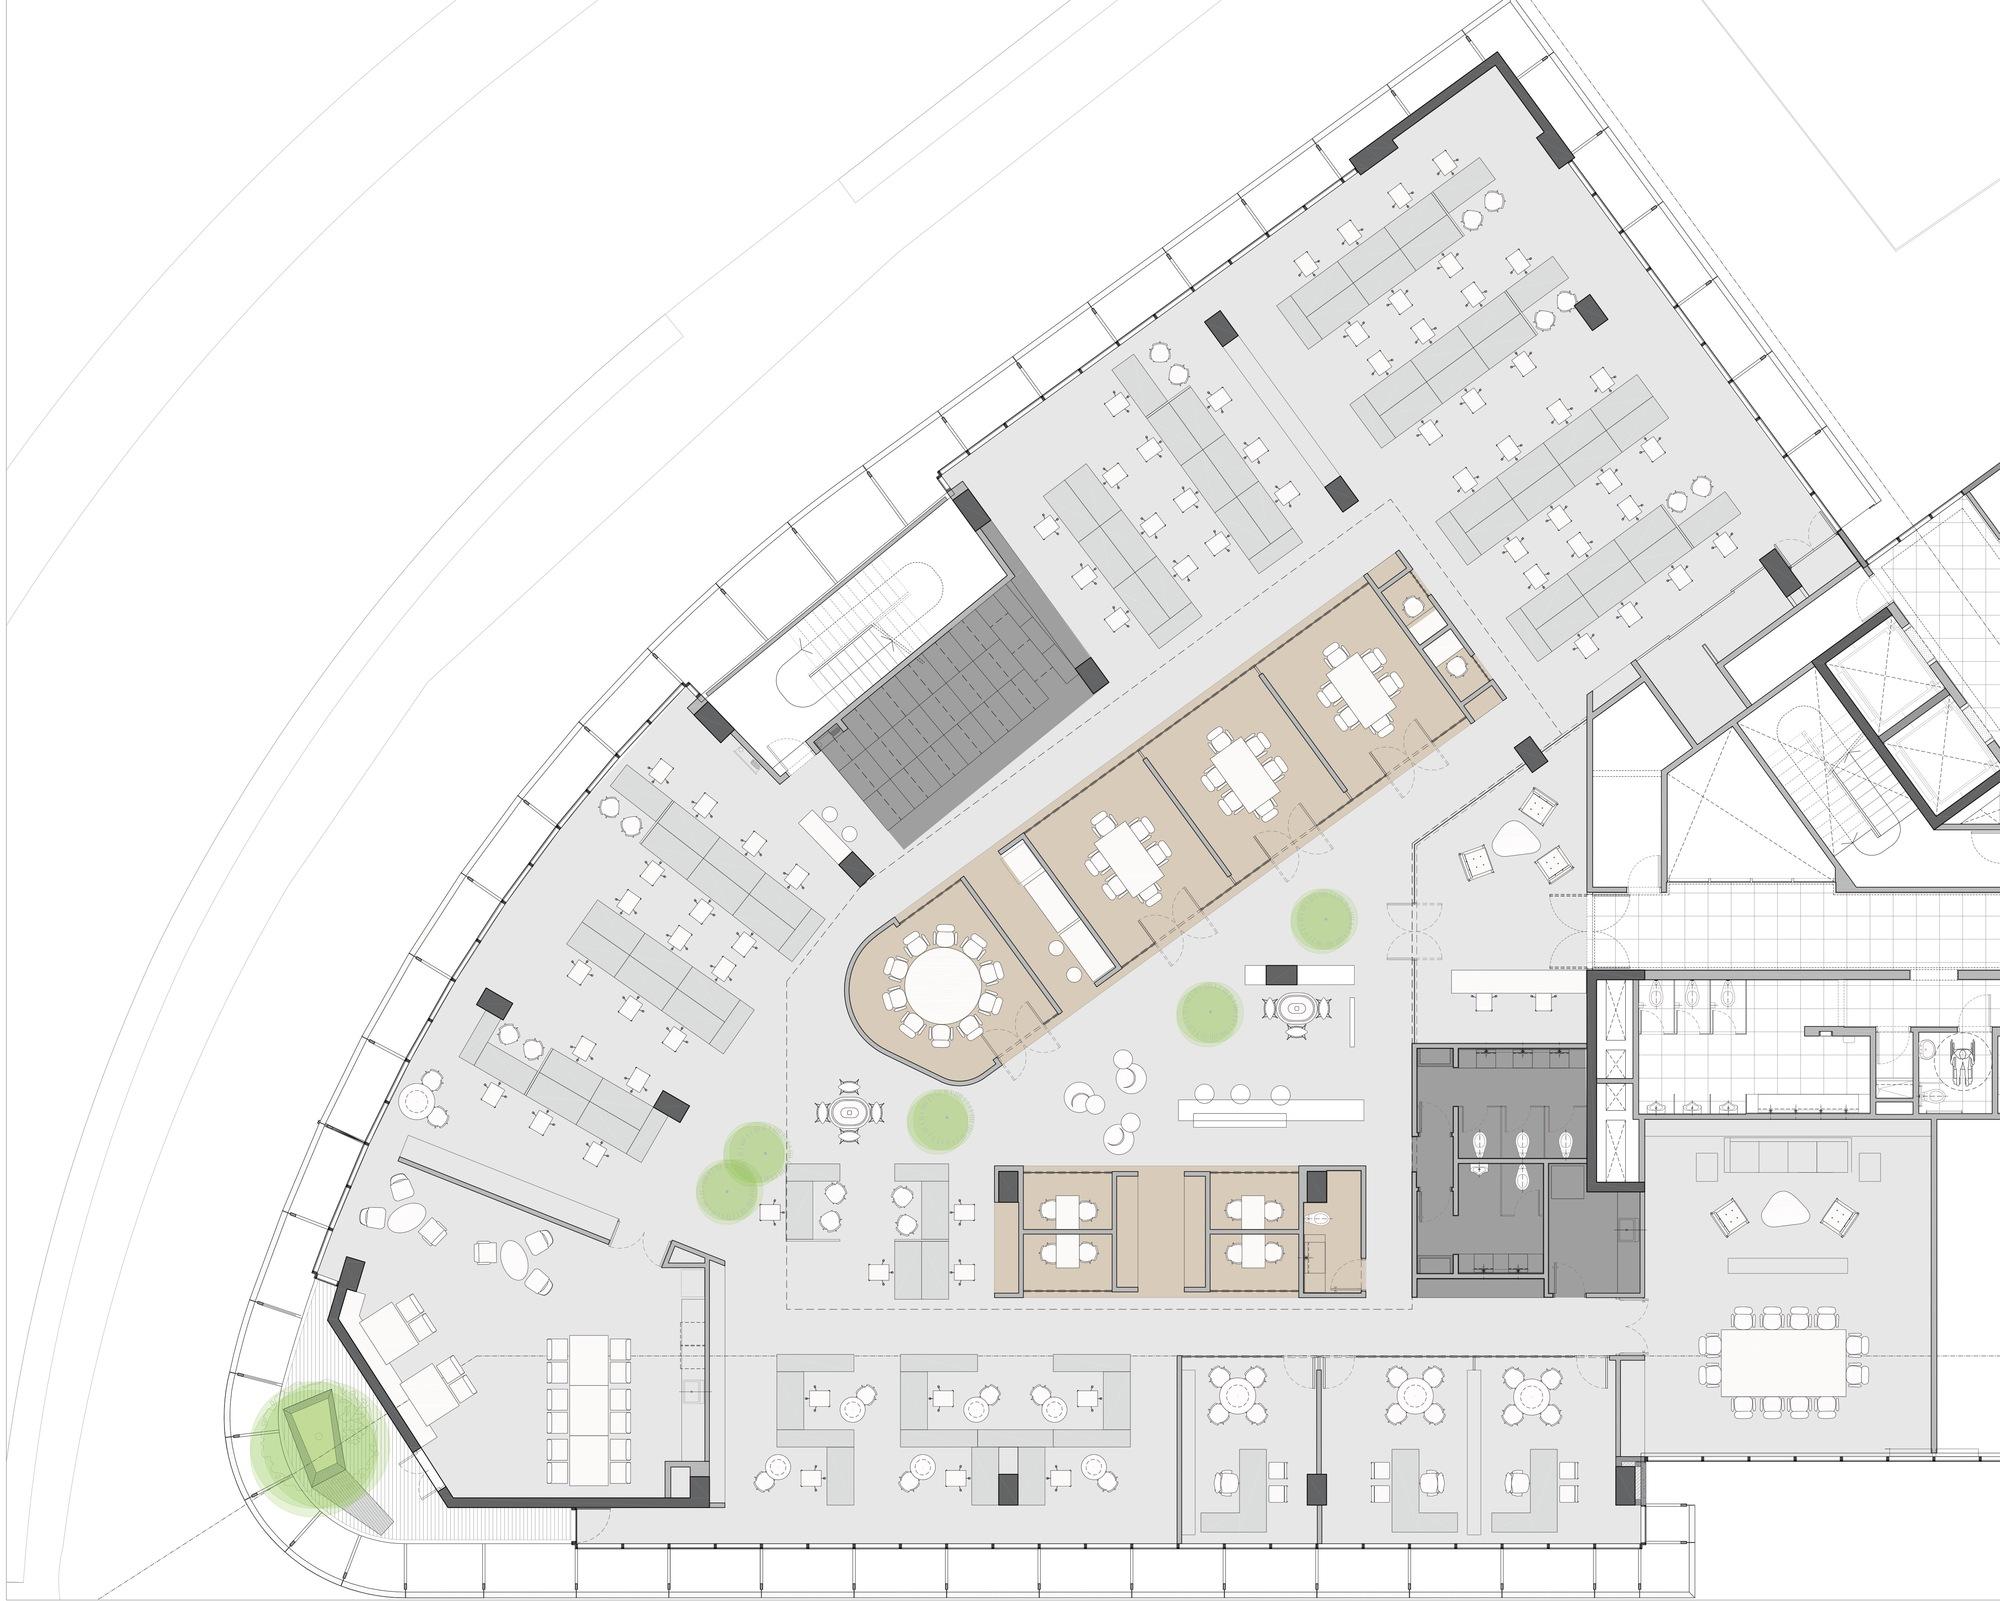 Galer a de oficinas galias arquitectura en estudio - Estudios de arquitectura en bilbao ...